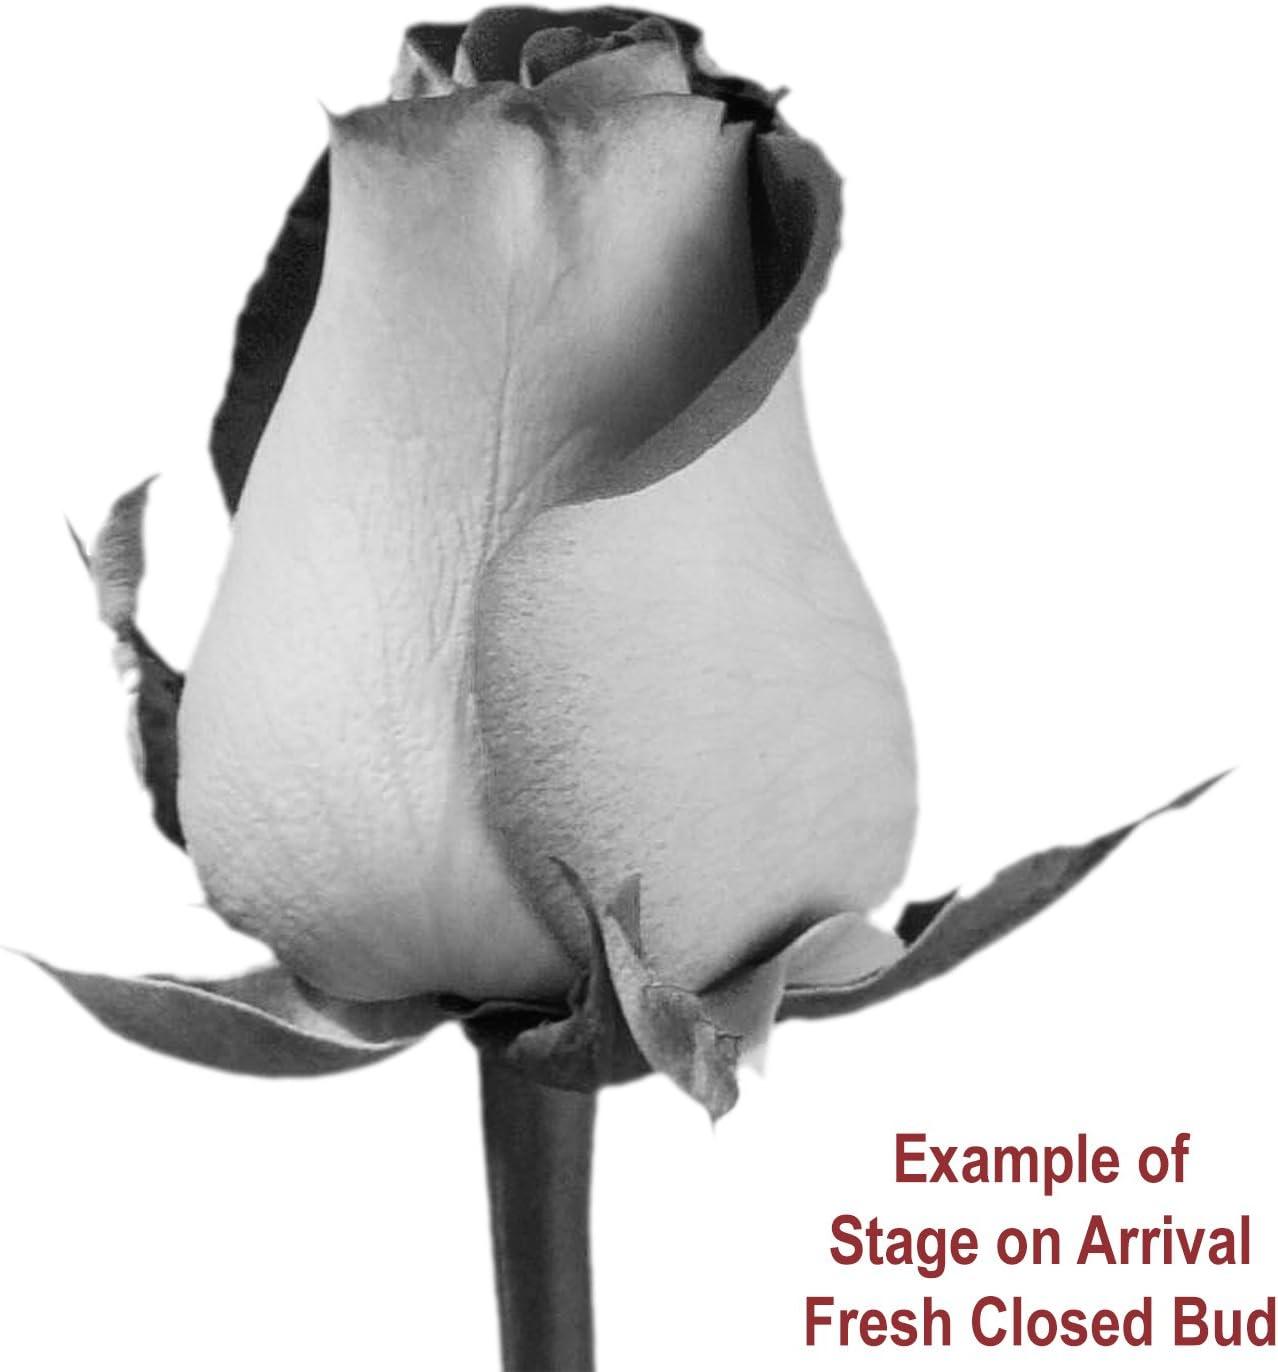 B00B2PN1E4 GlobalRose 50 Red Roses - Fresh Flowers- Delivery By Thursday April 23 81oU3AvHlDL